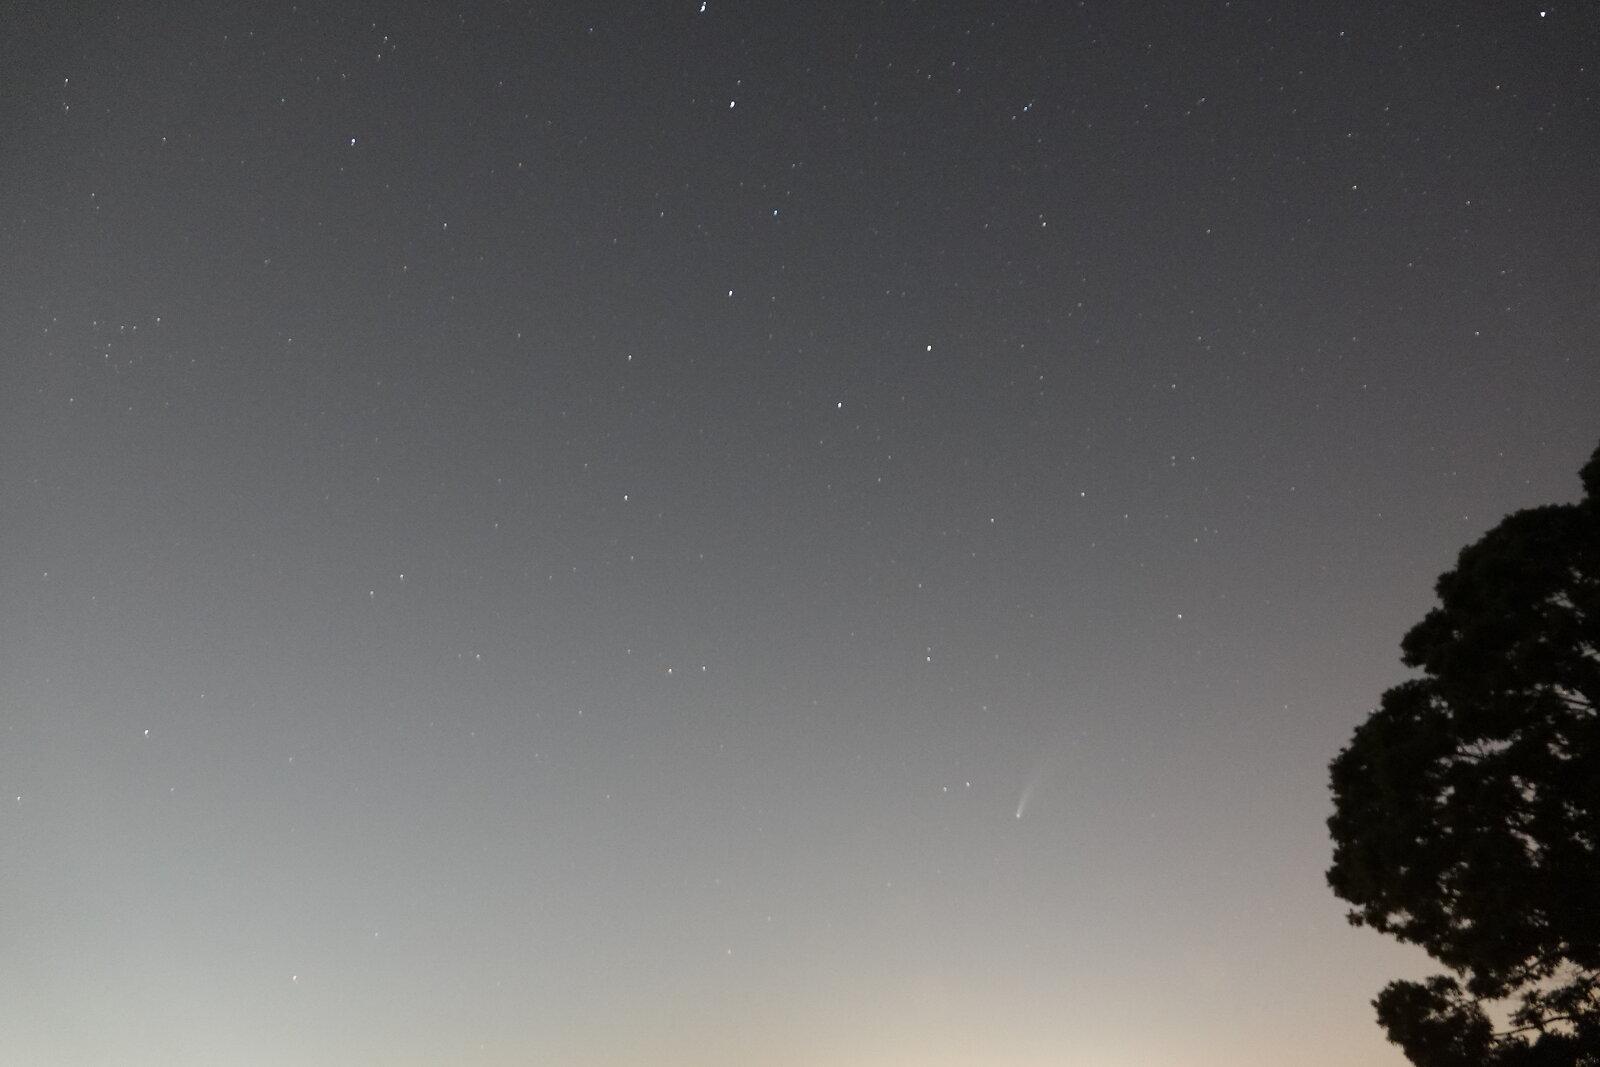 RX10 Comet neowise 002.JPG